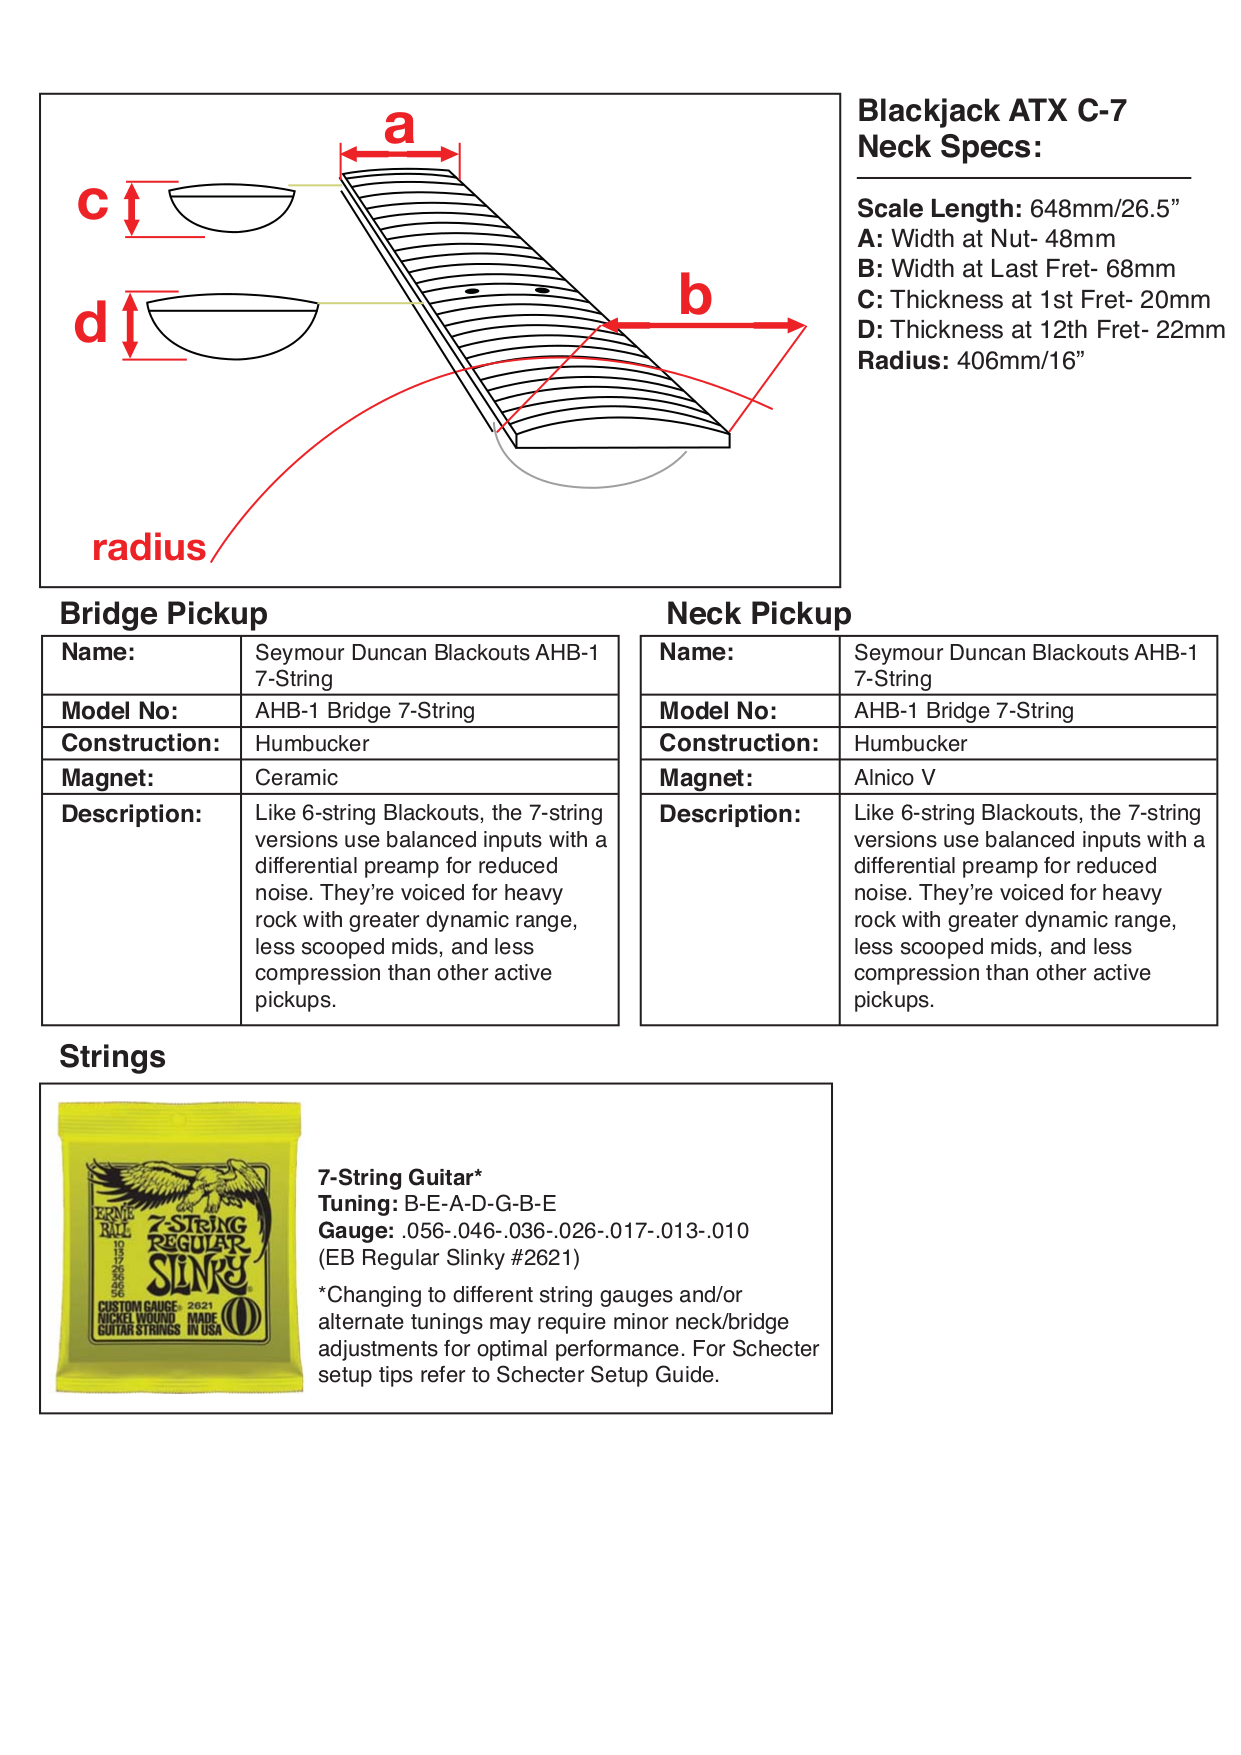 schecter guitar wiring diagram schecter image schecter c 1 wiring diagram jodebal com on schecter guitar wiring diagram